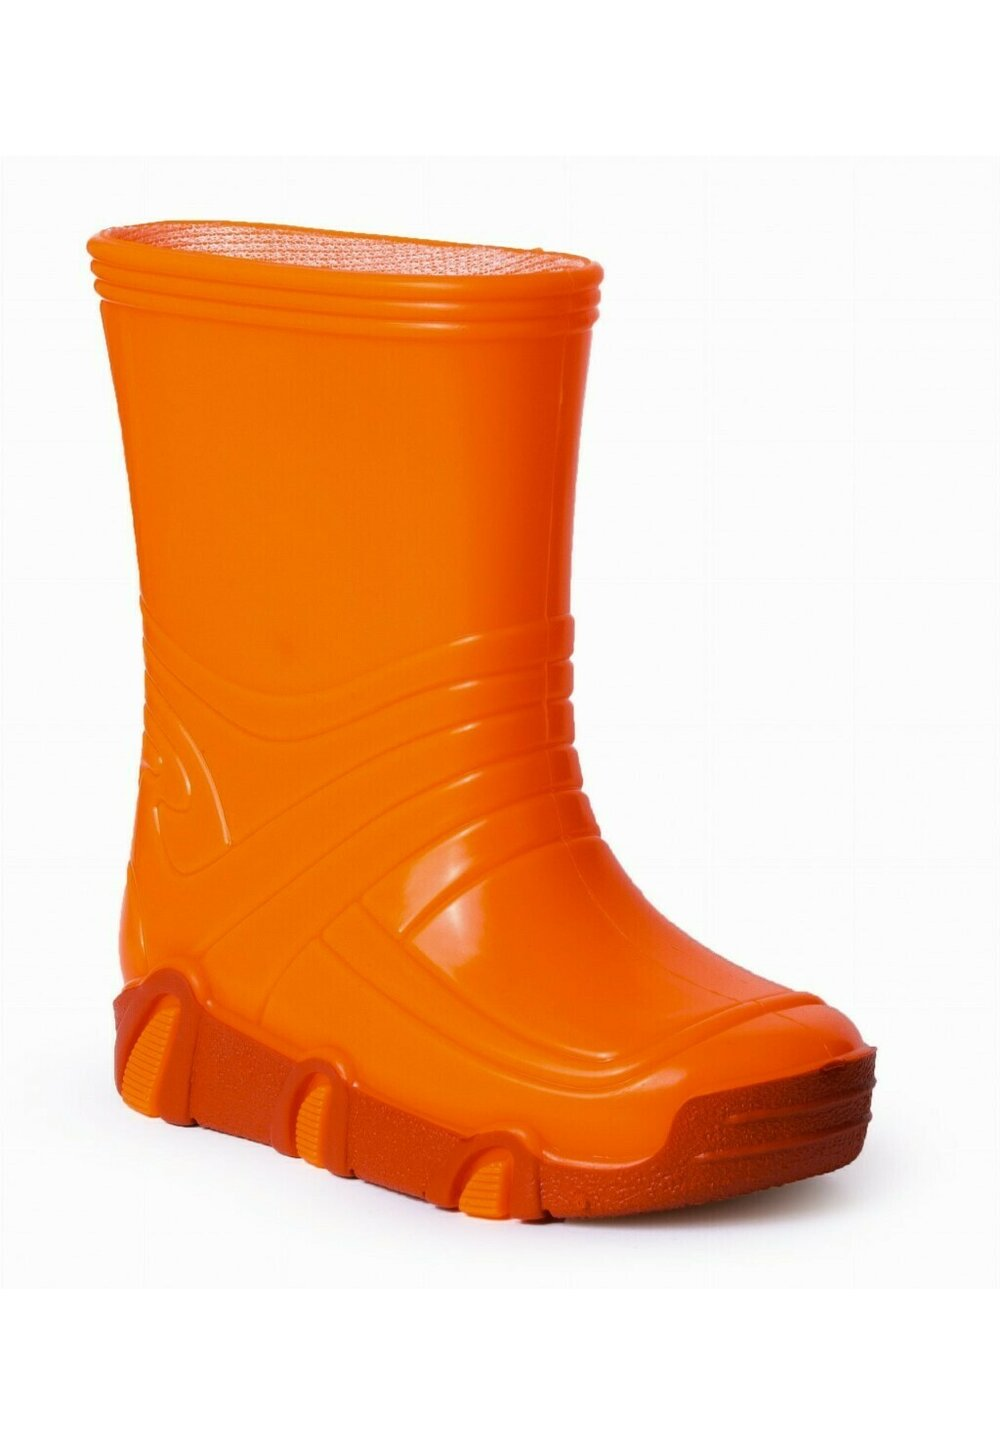 Cizme de cauciuc, portocaliu neon imagine